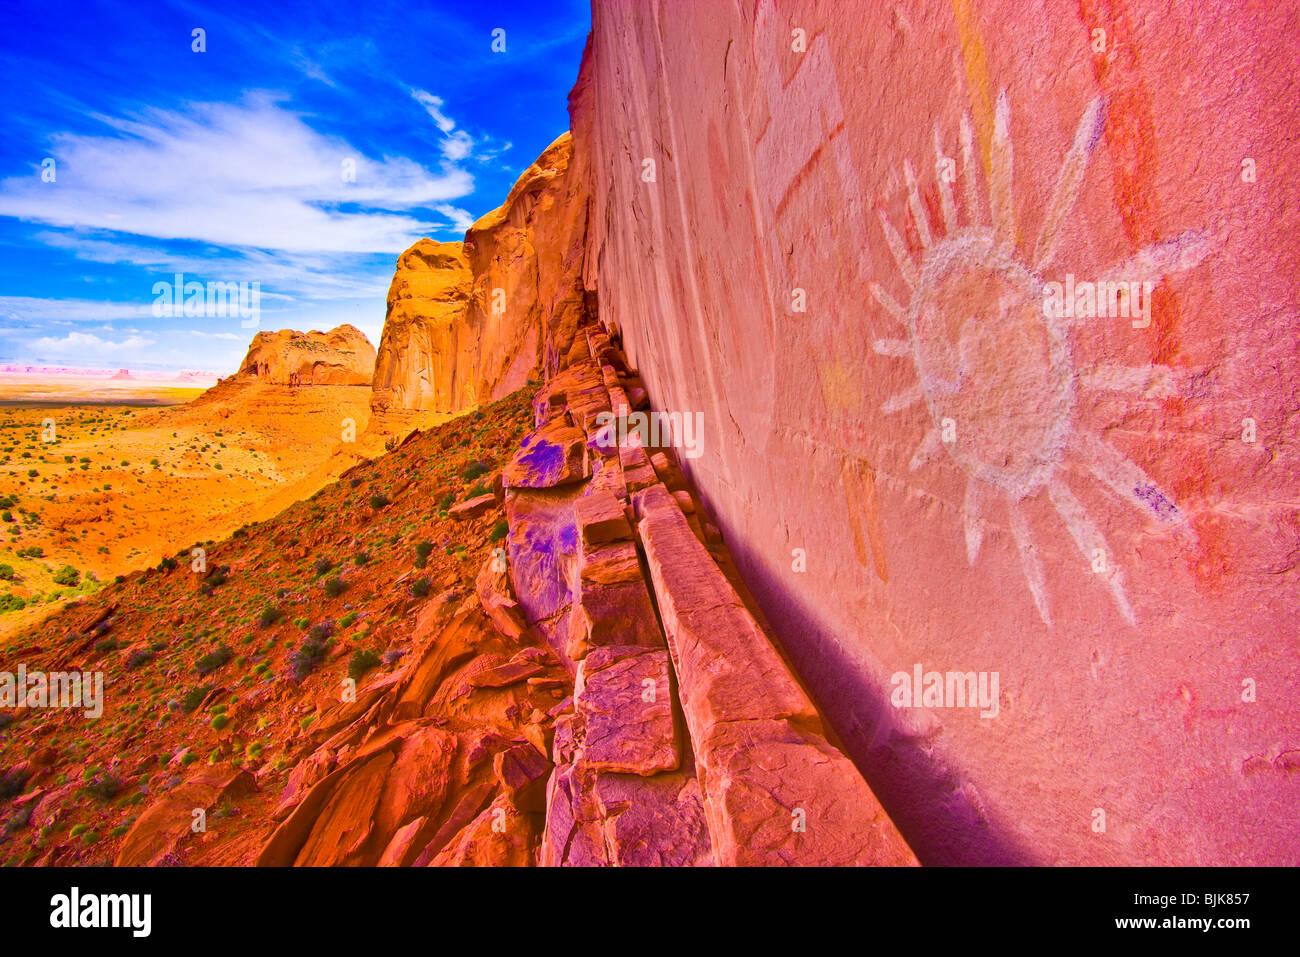 Alte Sonne Piktogramm, Northern Arizona, Korbflechtern Kultur Felsmalereien Stockbild